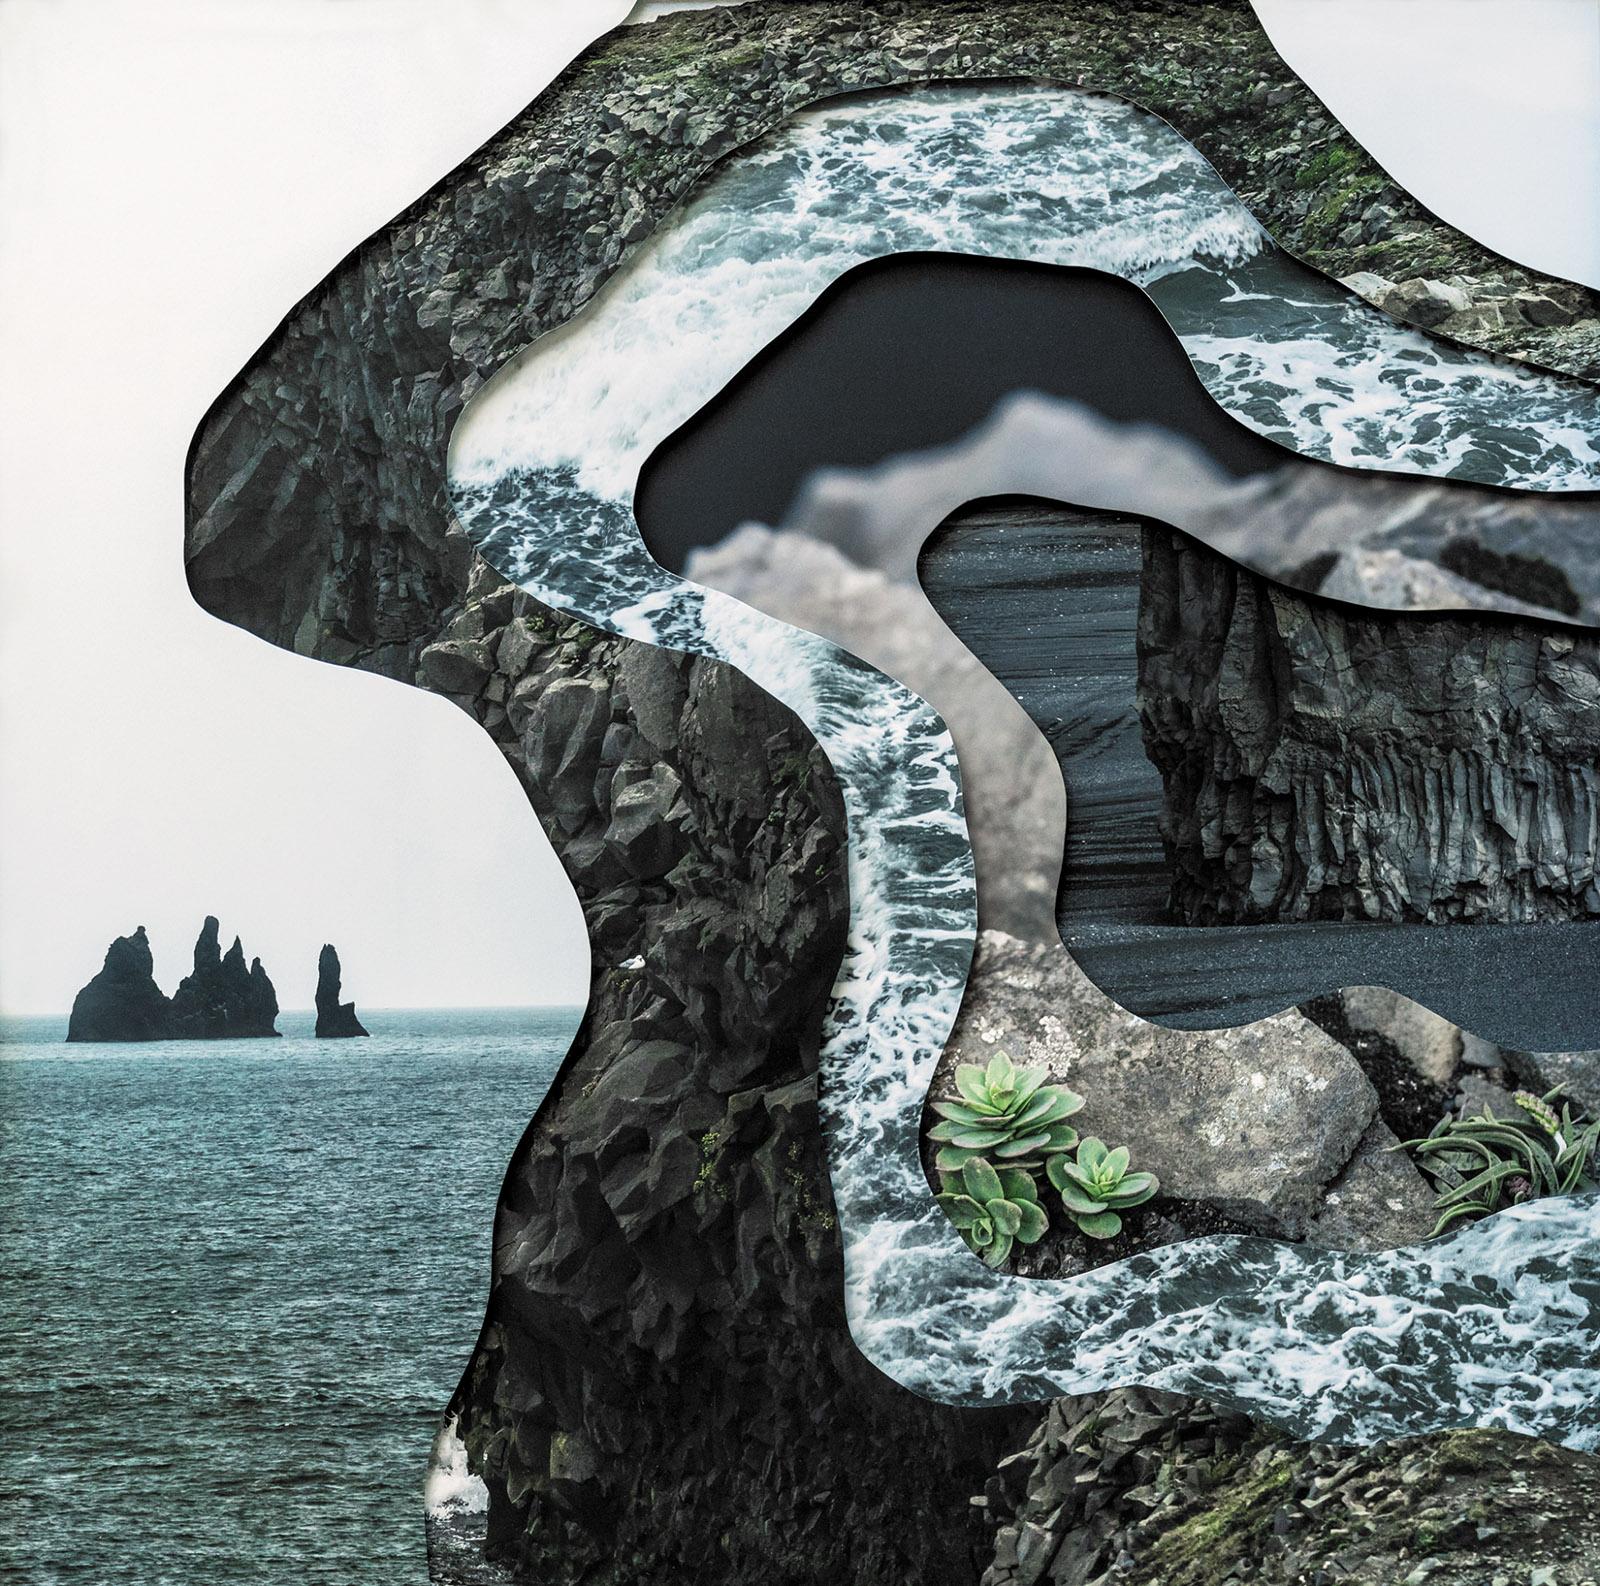 Charlotta María Hauksdóttir's Topography Study XVI, 2018; from Hauksdóttir's book A Sense of Place: Imprints from Iceland